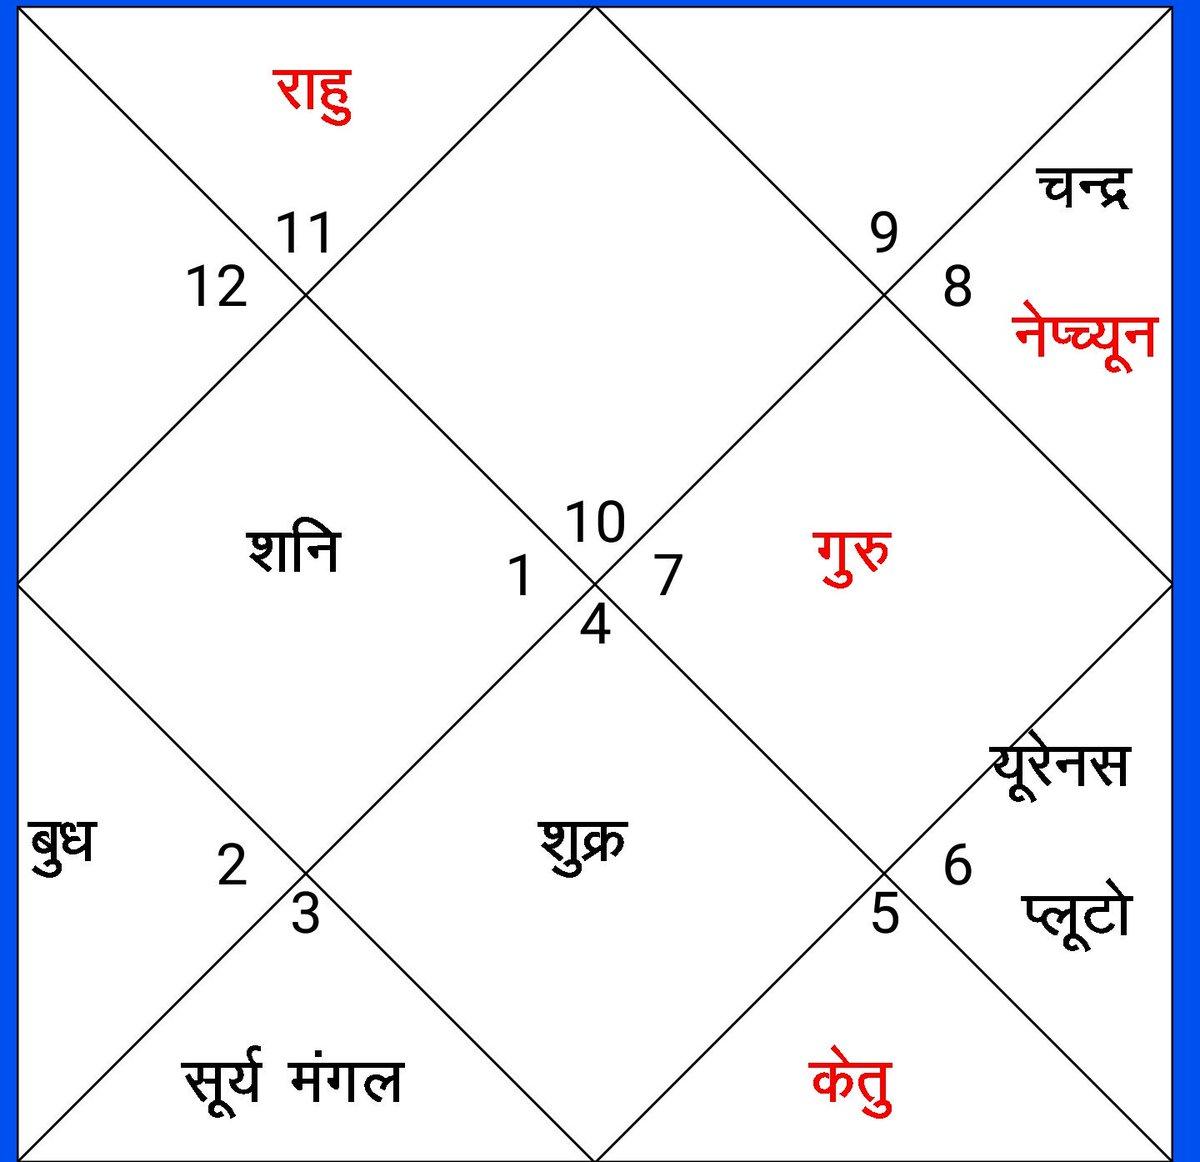 Sshashank Upadhyay......🇮🇳 on Twitter